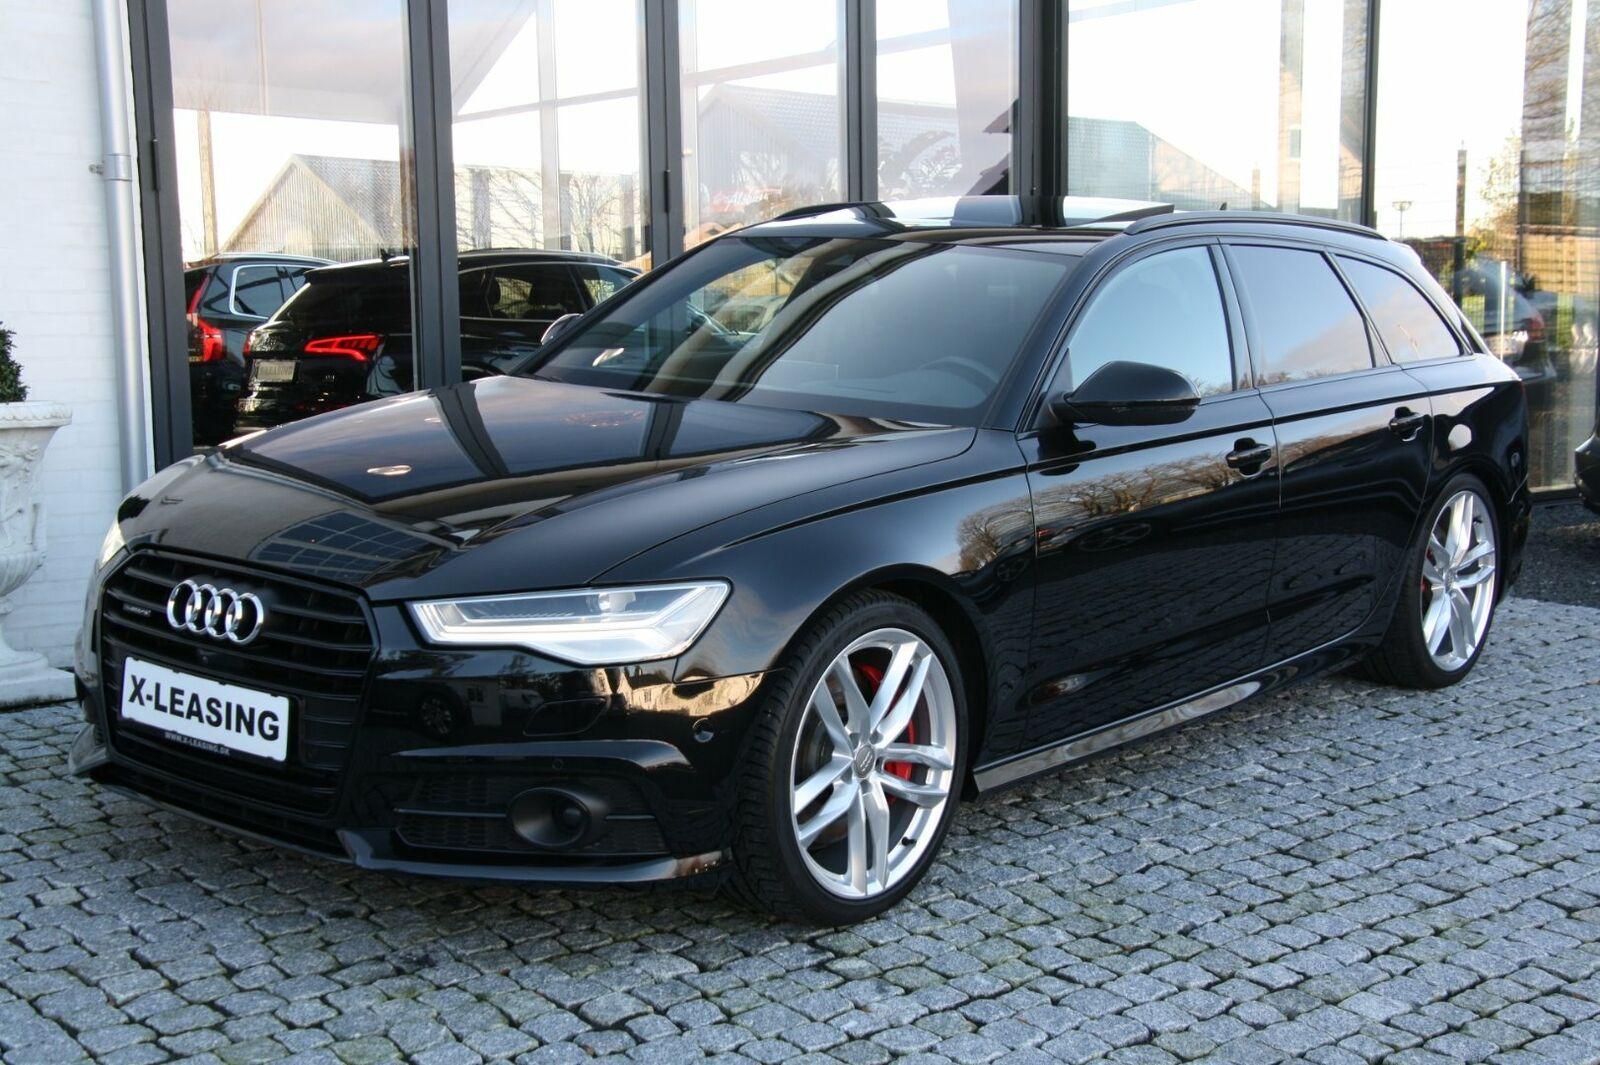 Audi A6 3,0 TDi 326 Avant quattro Tiptr. 5d - 4.635 kr.